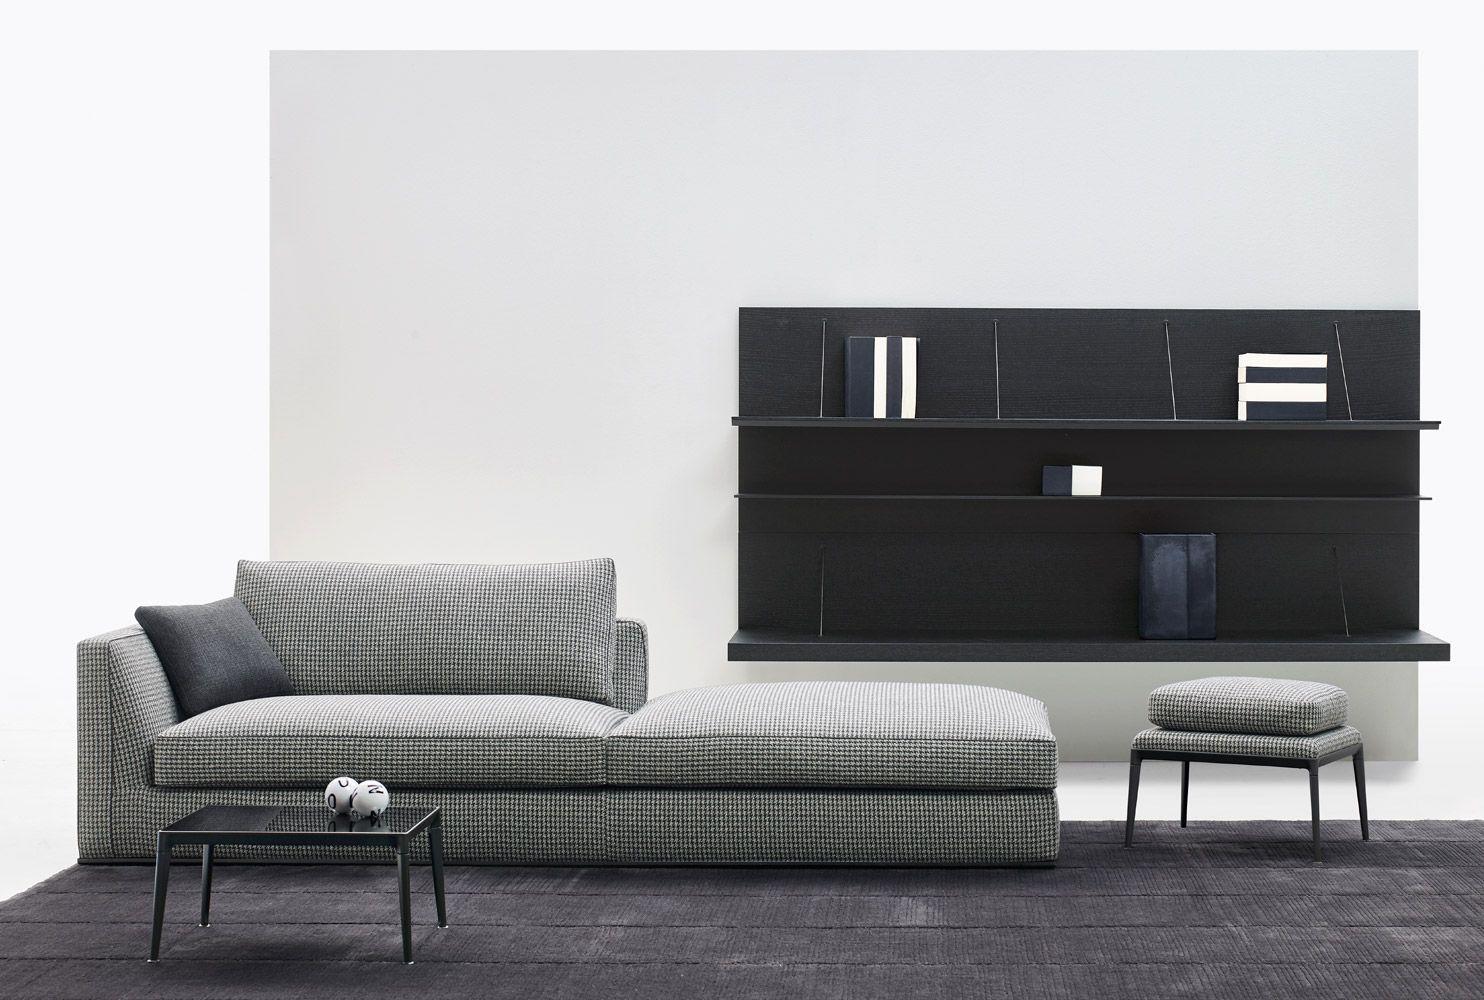 Sofa Richard Collection B B Italia Design Antonio Citterio Italia Design B B Italia Fabric Sofa Design